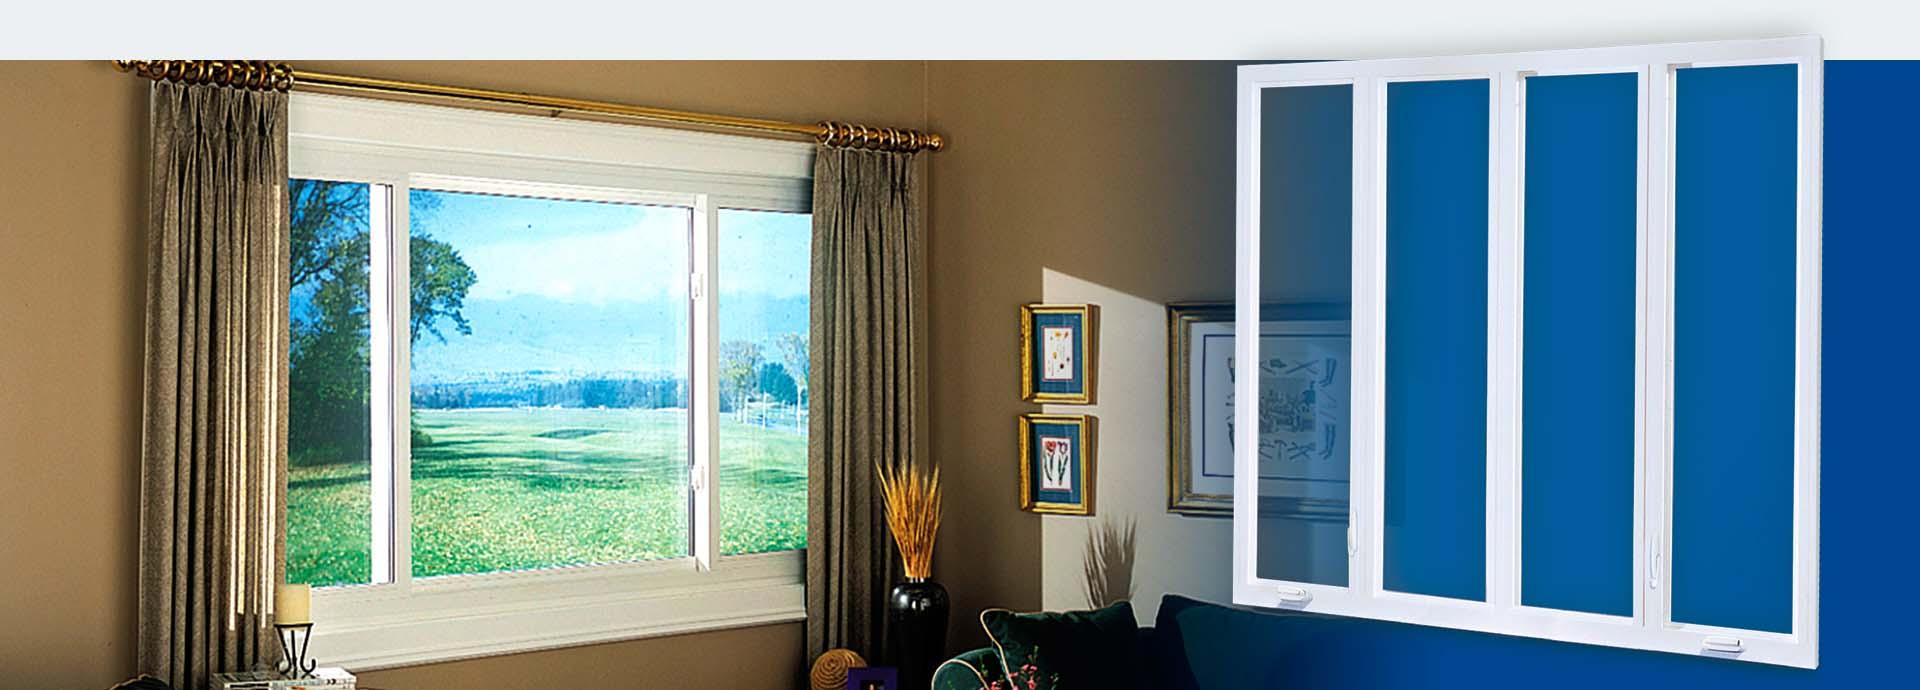 window replacement dallas window world of dallas fort worth